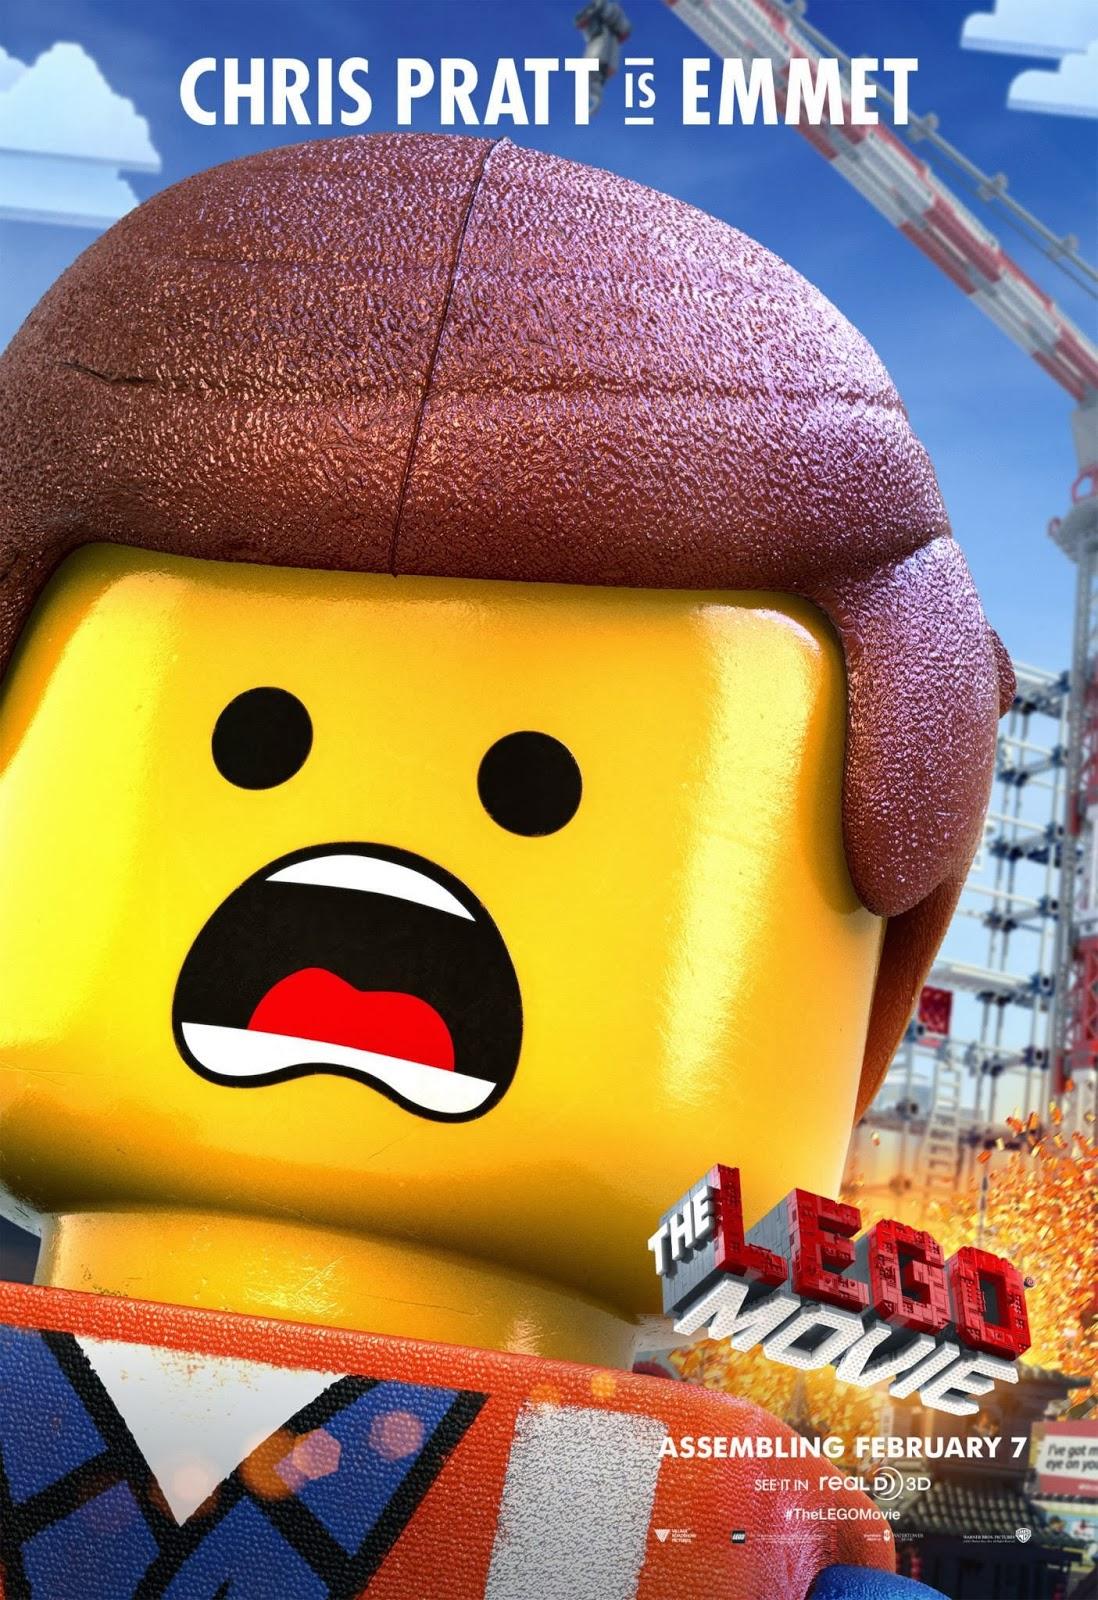 Adoption at the Movies : The Lego Movie Adoption Movie Guide